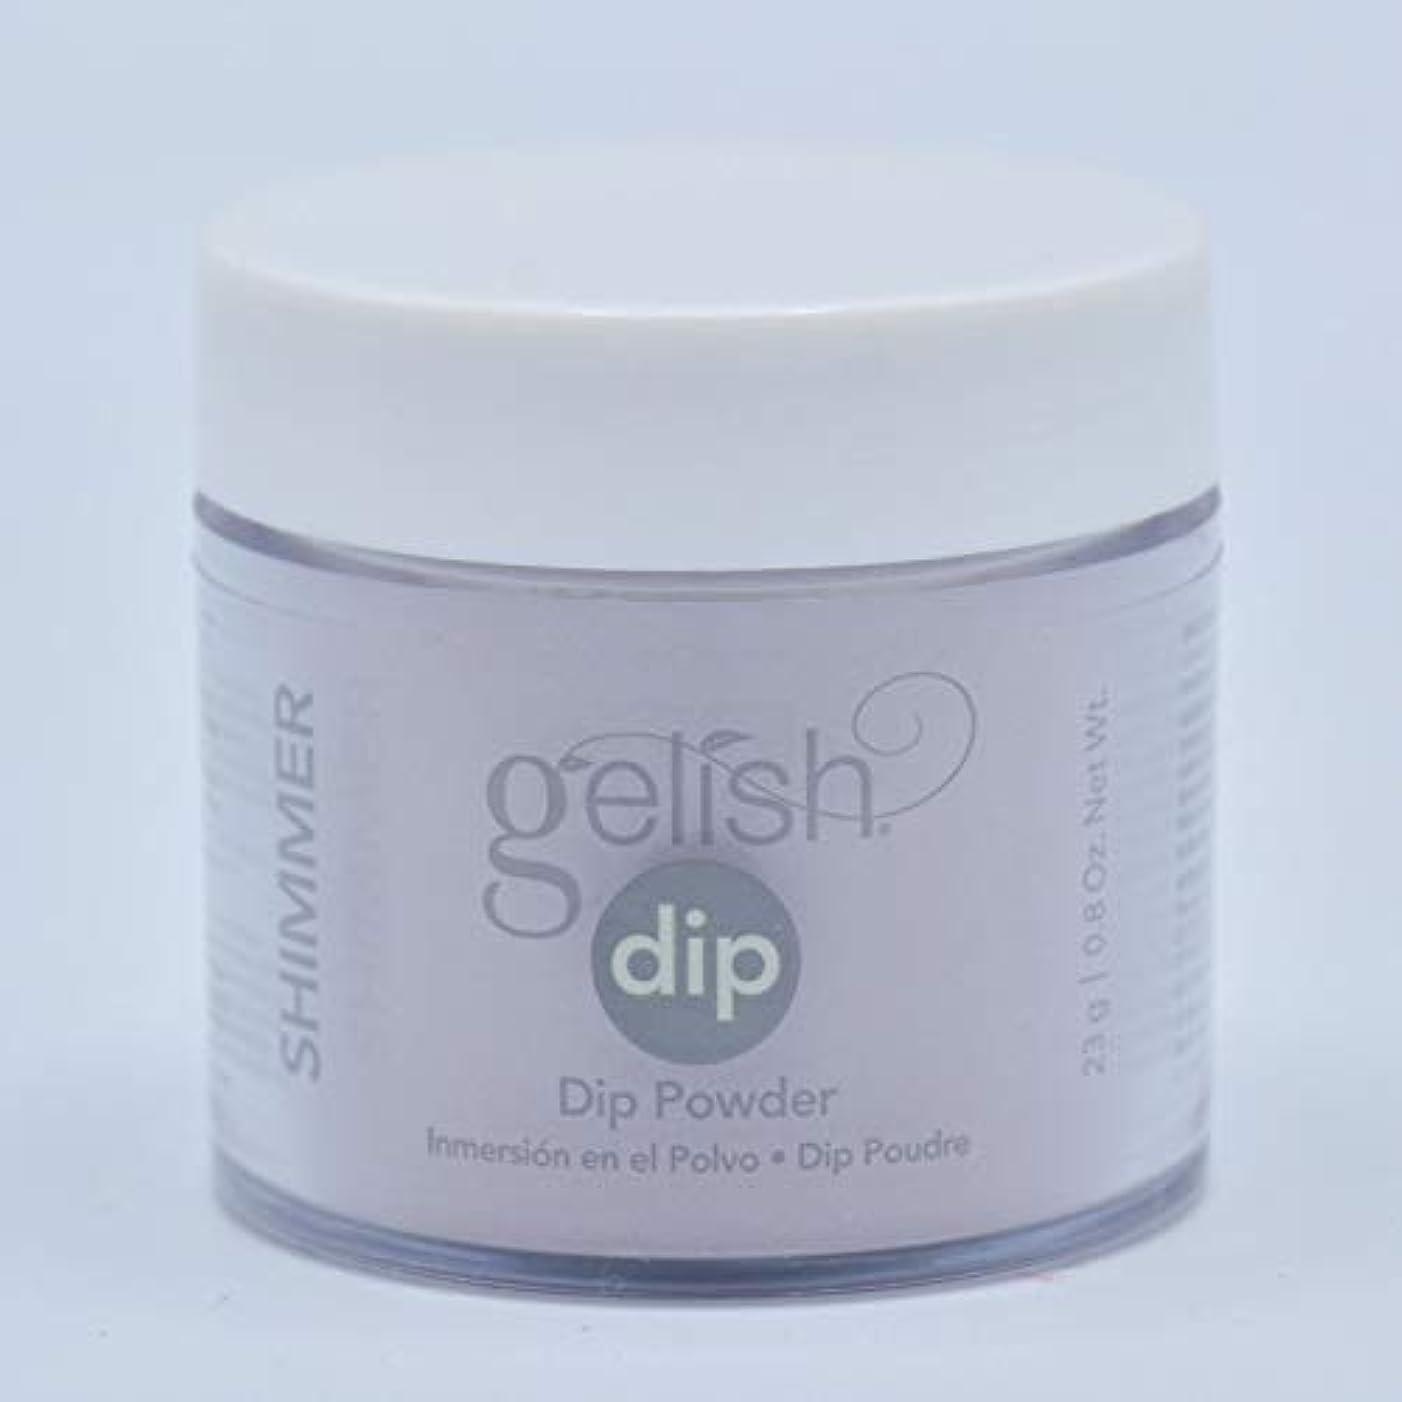 大惨事髄発音Harmony Gelish - Acrylic Dip Powder - From Rodeo to Rodeo Drive - 23g / 0.8oz